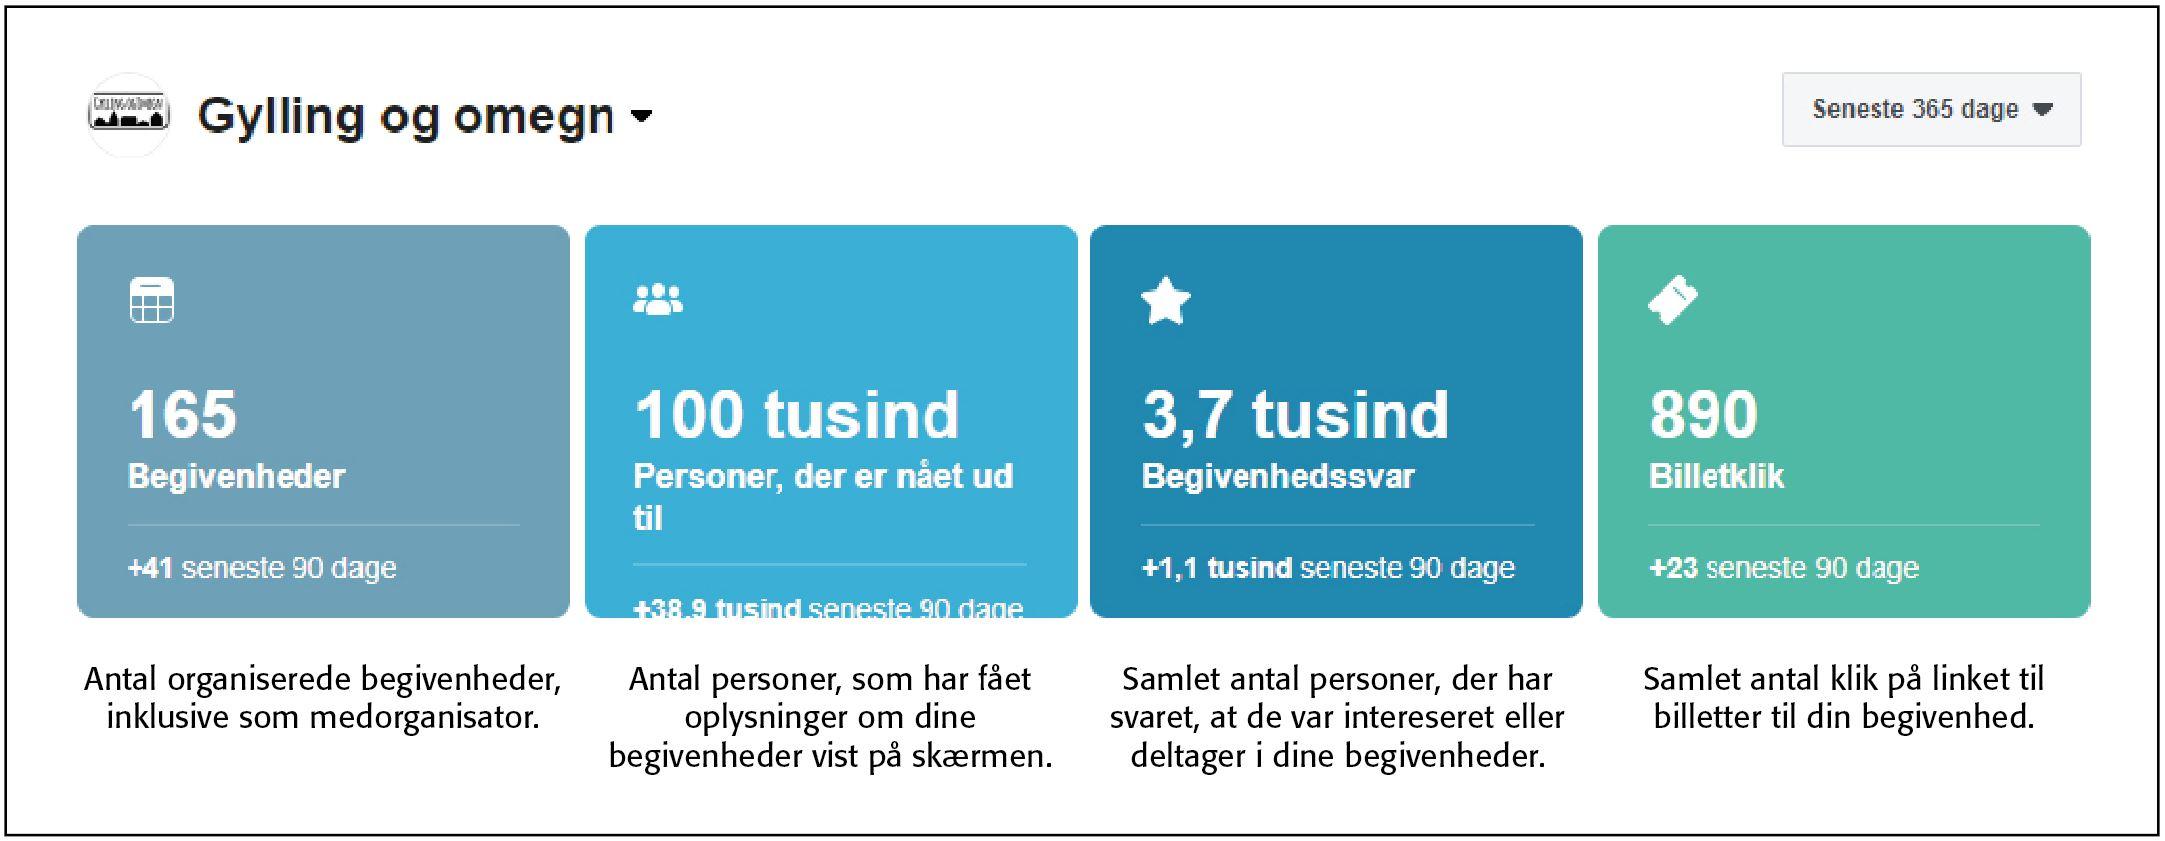 Projekt Visuel Landsby når imponerende tal